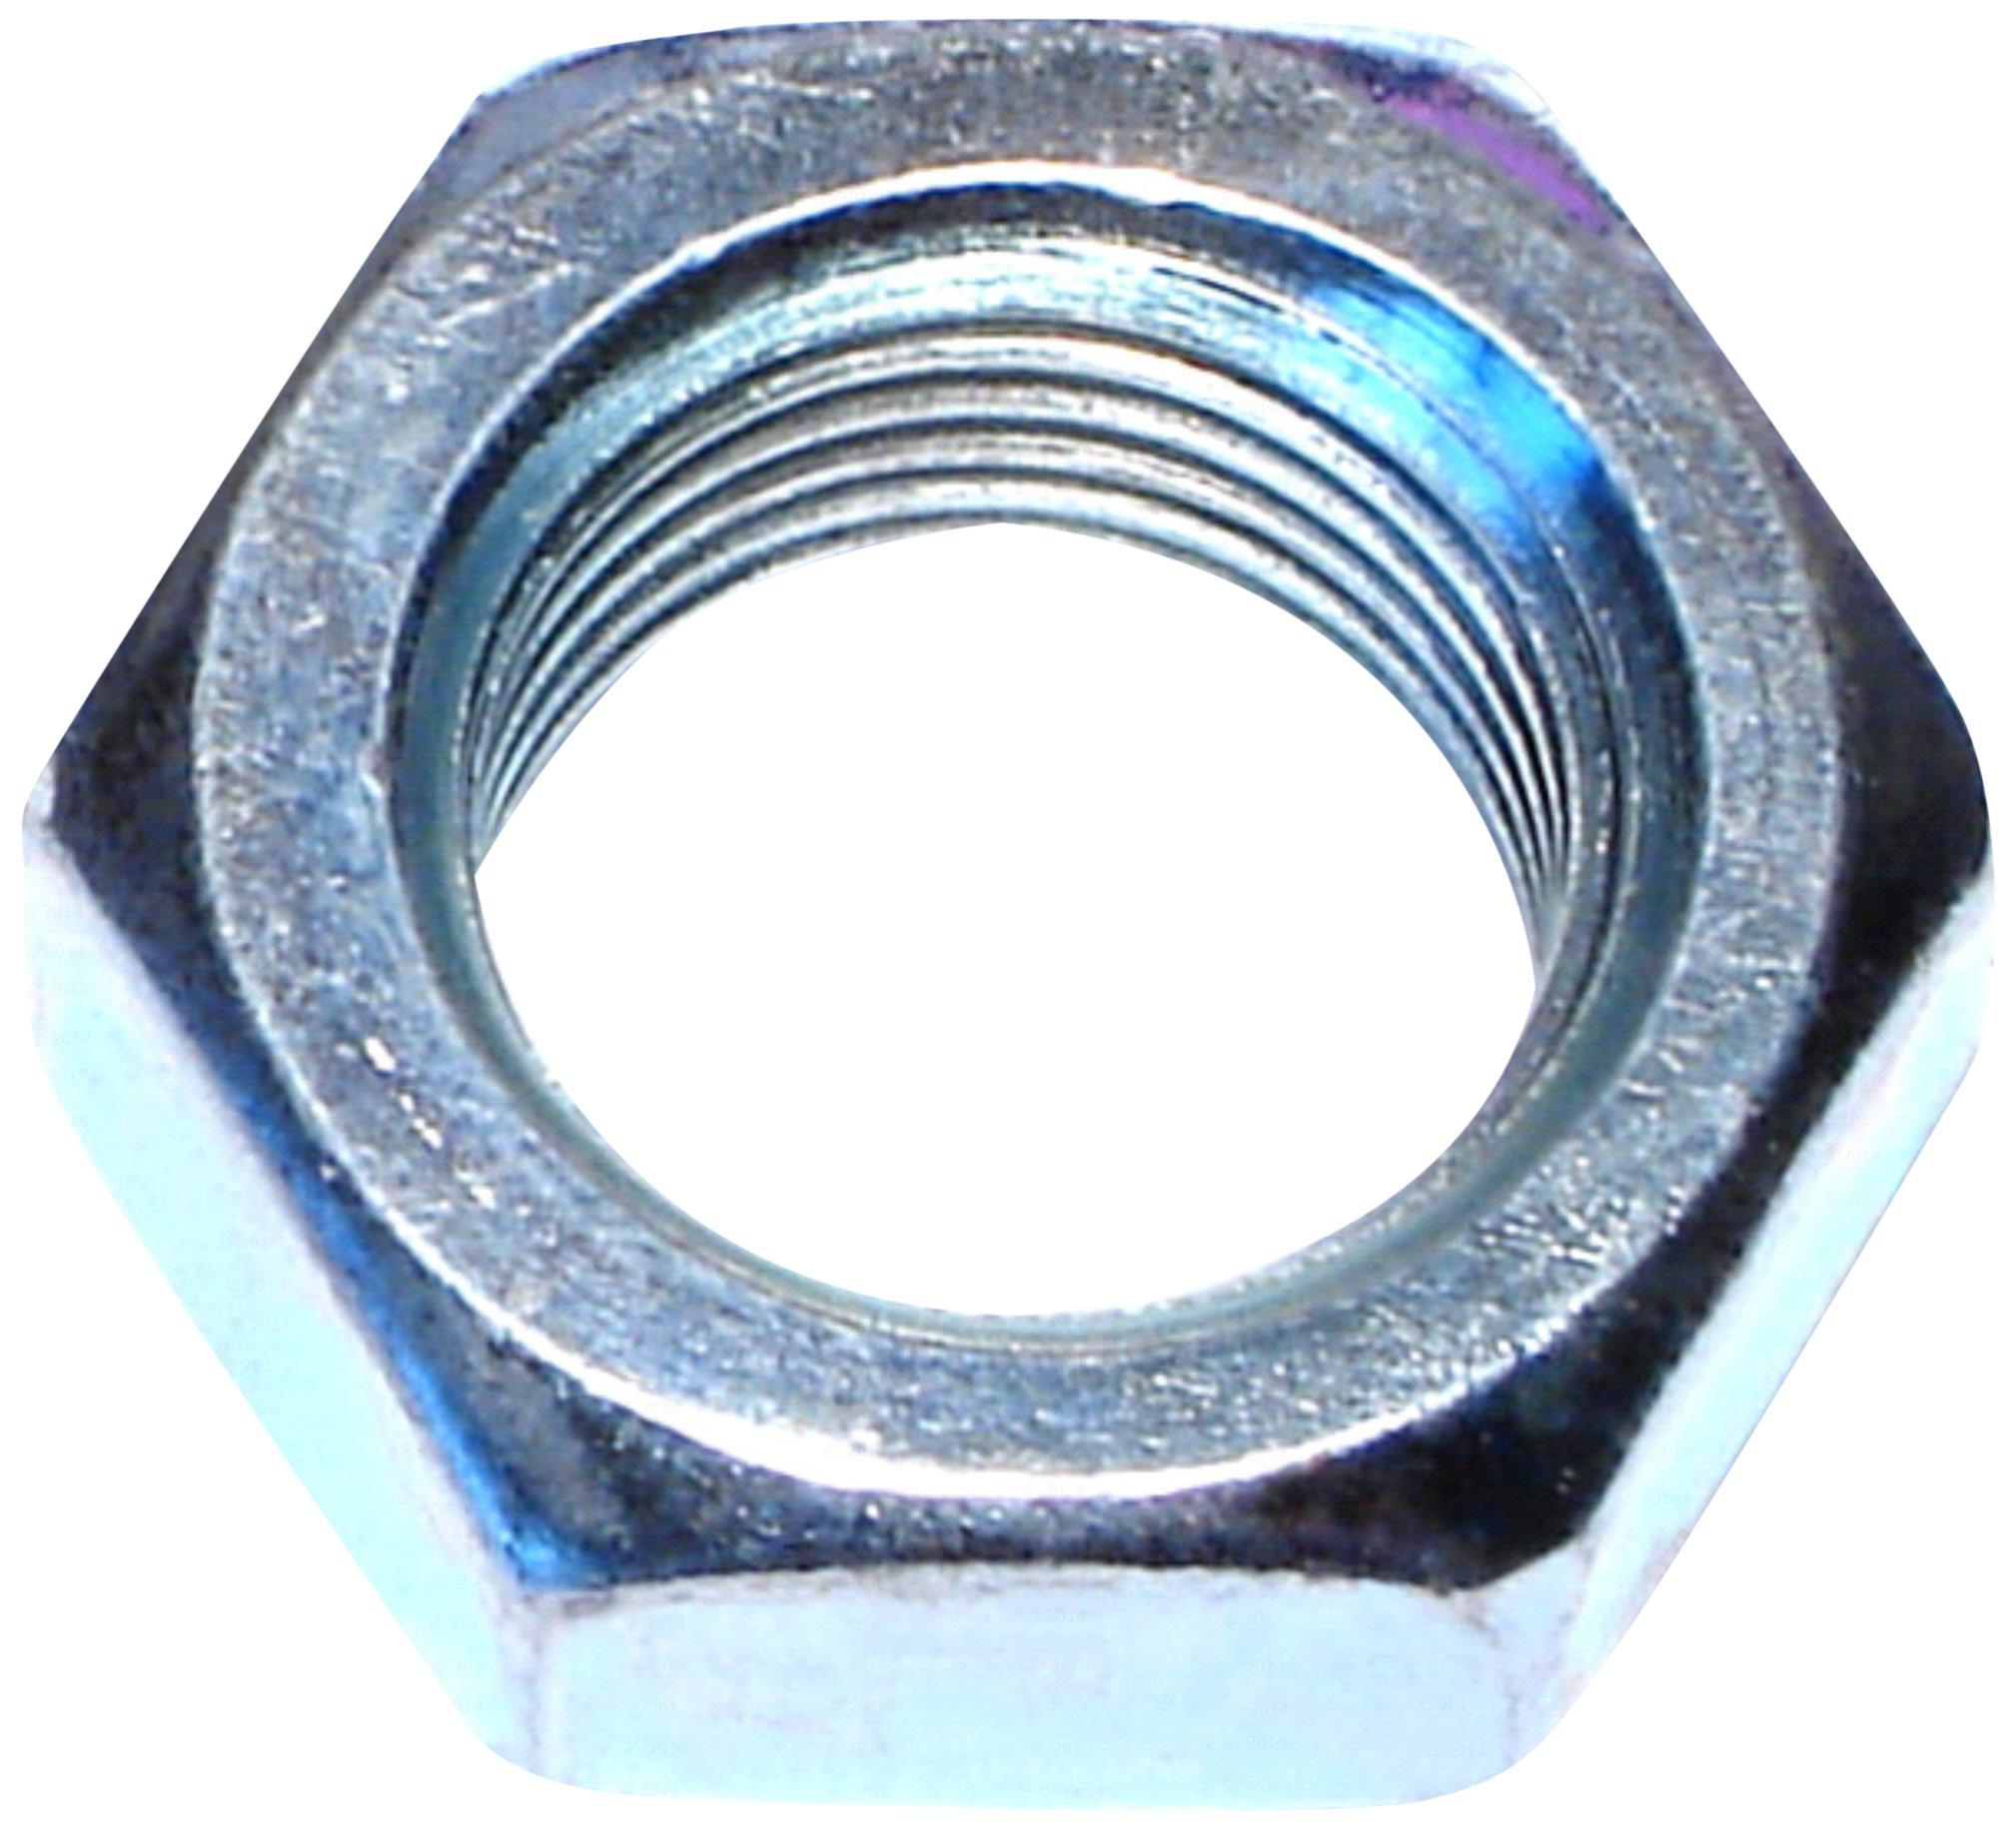 Hard-to-Find Fastener JNS-210-5 Fine Hex Jam Nuts (5 Piece) (Pack of 5), 5/8-18''